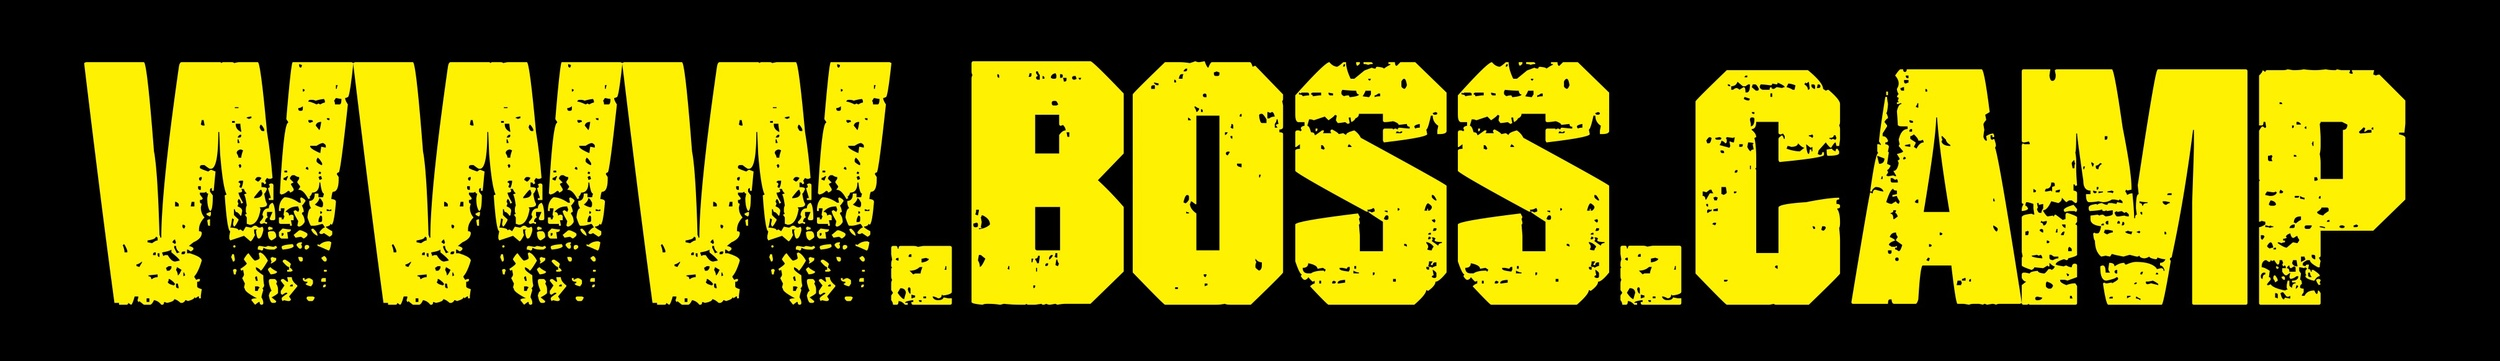 Be a better boss and get better employee performance with www.boss.camp jpeg